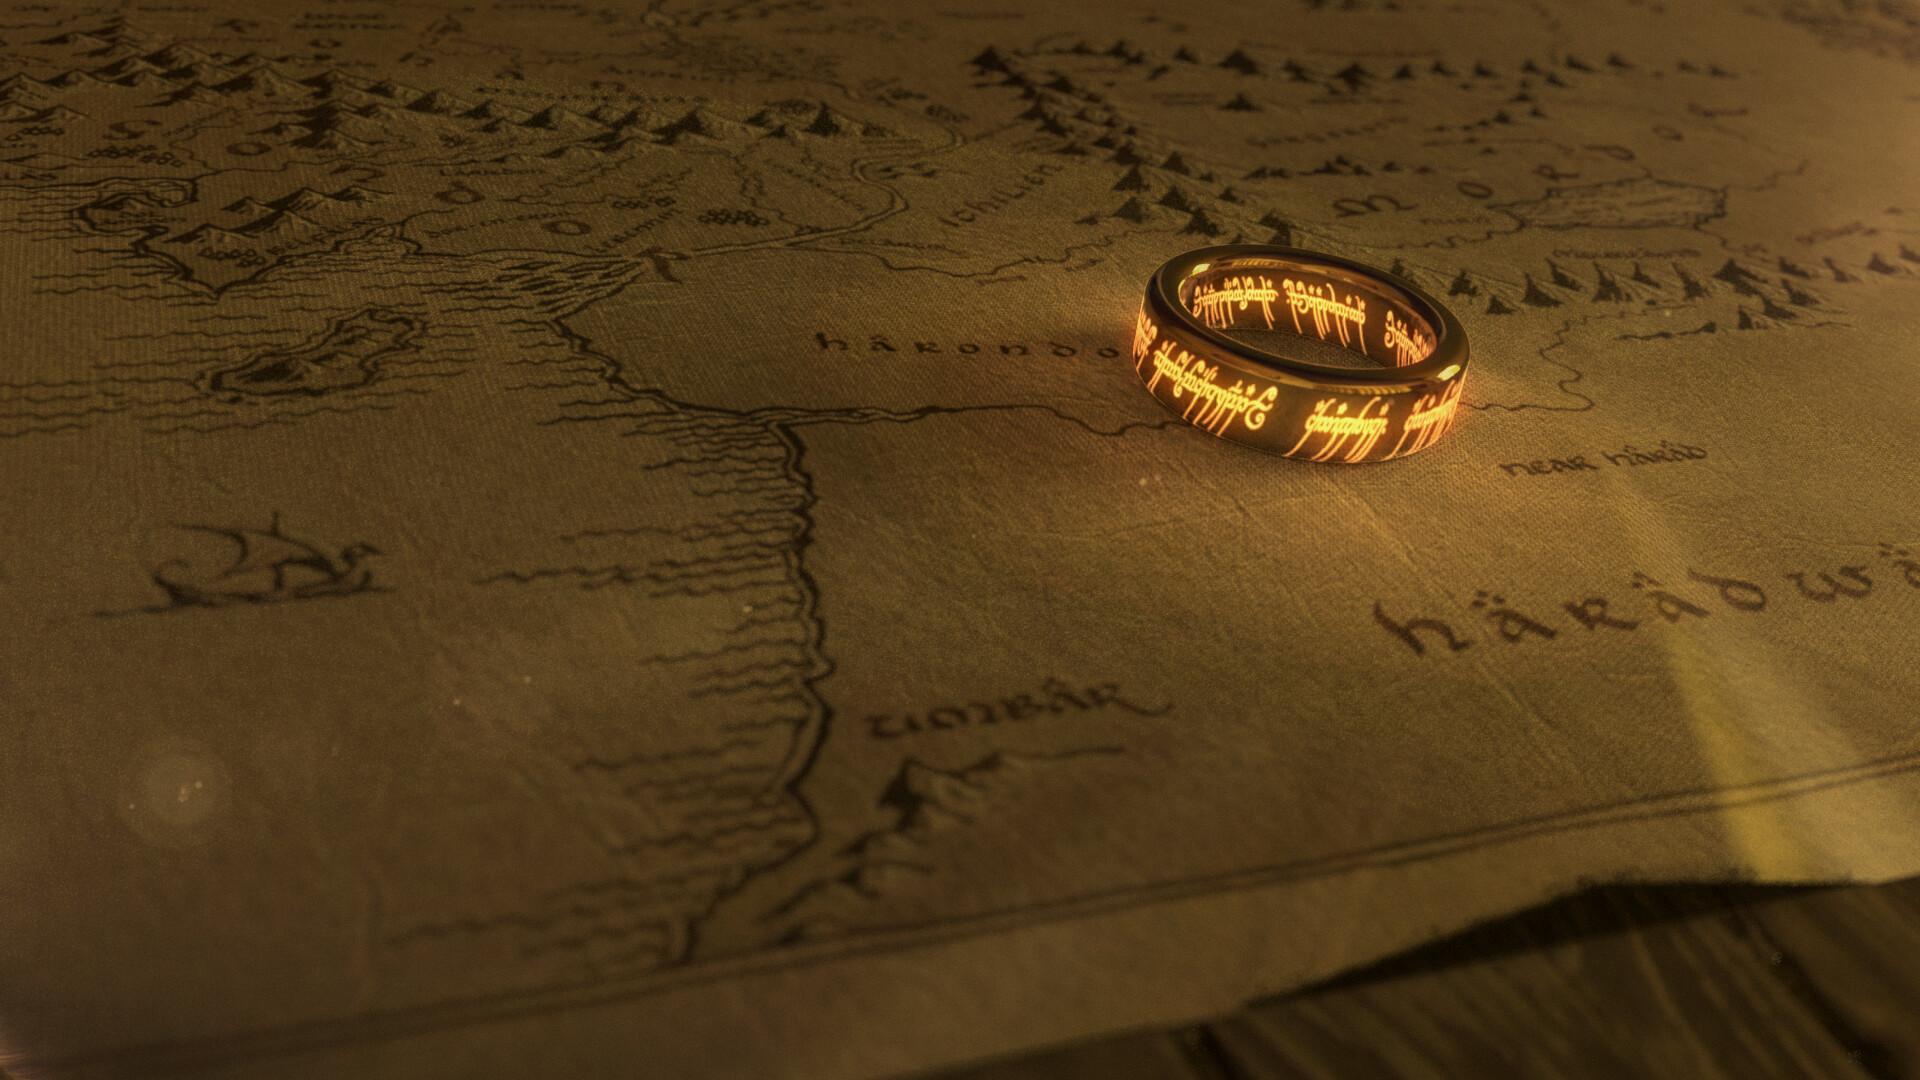 ArtStation - Lord of the Rings - Ring, Ruslan Agliullin